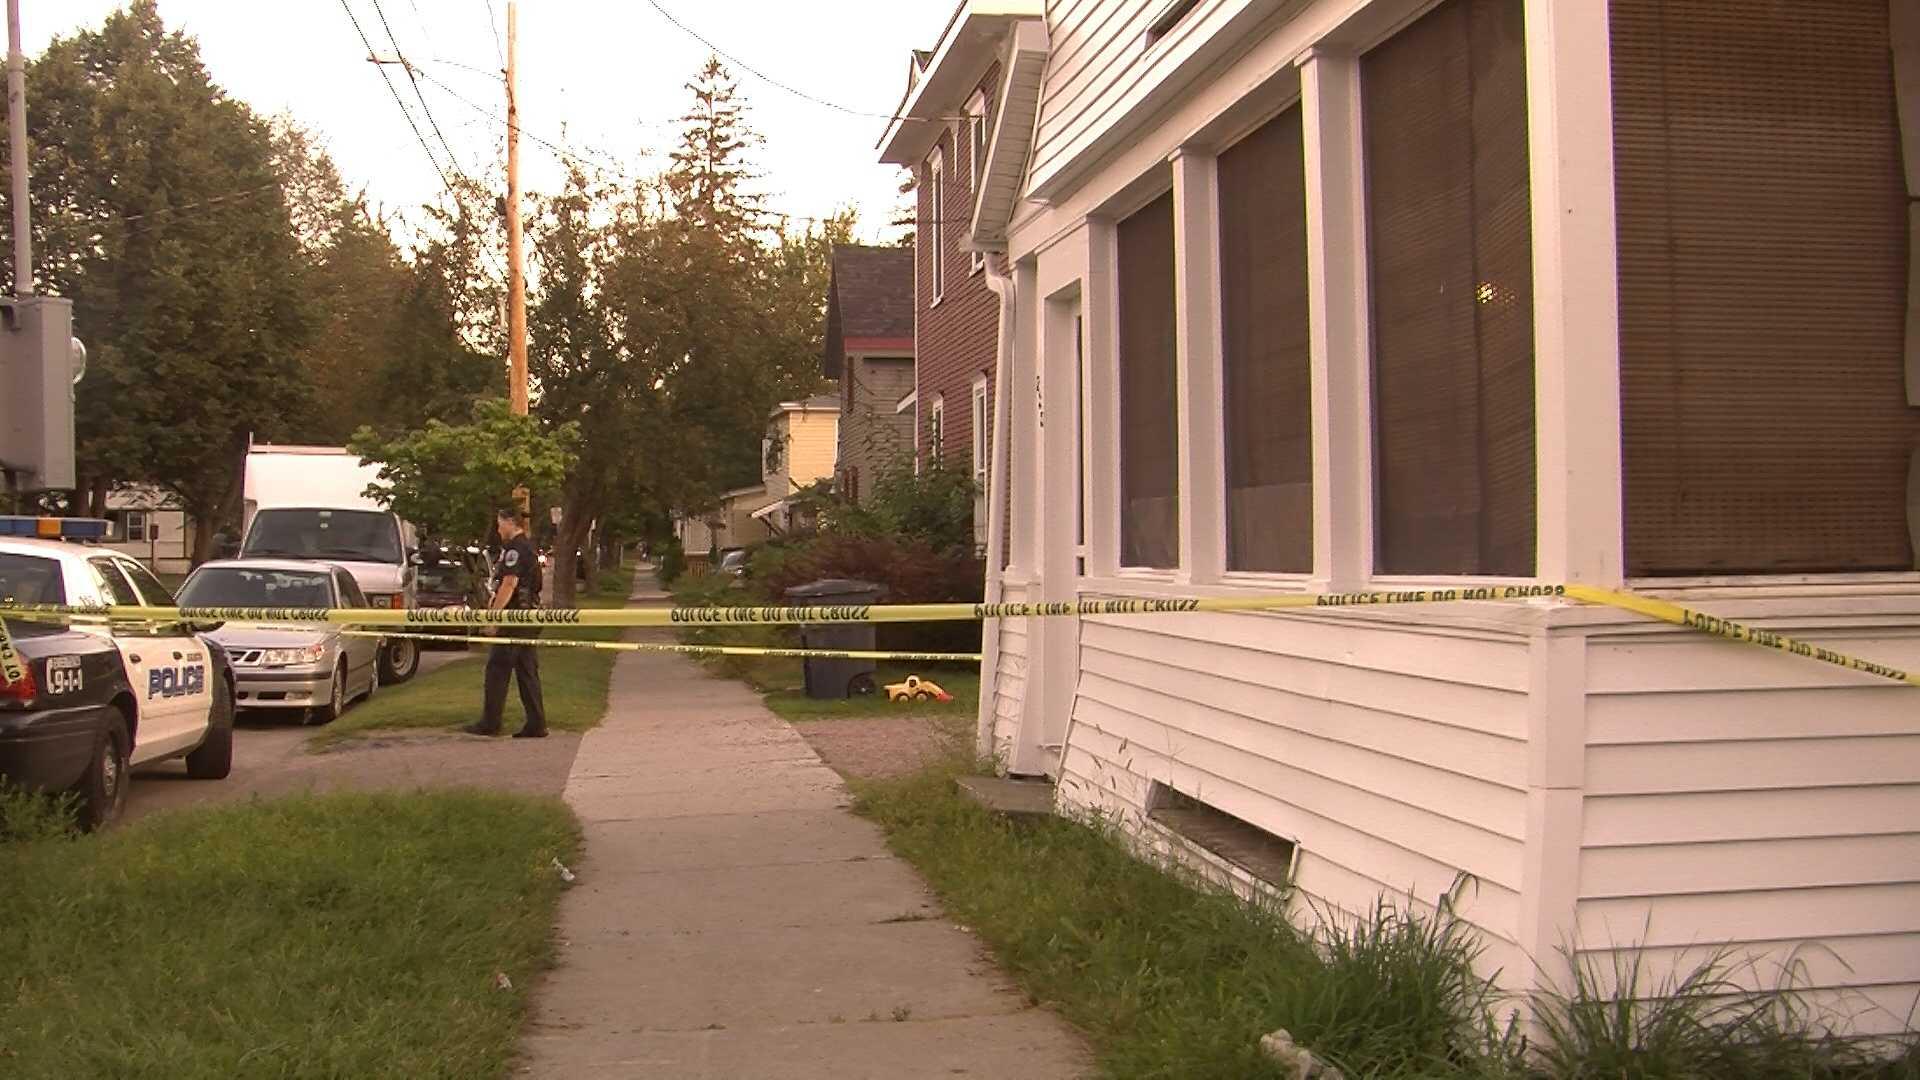 09-01-13 Police investigating stabbing - img